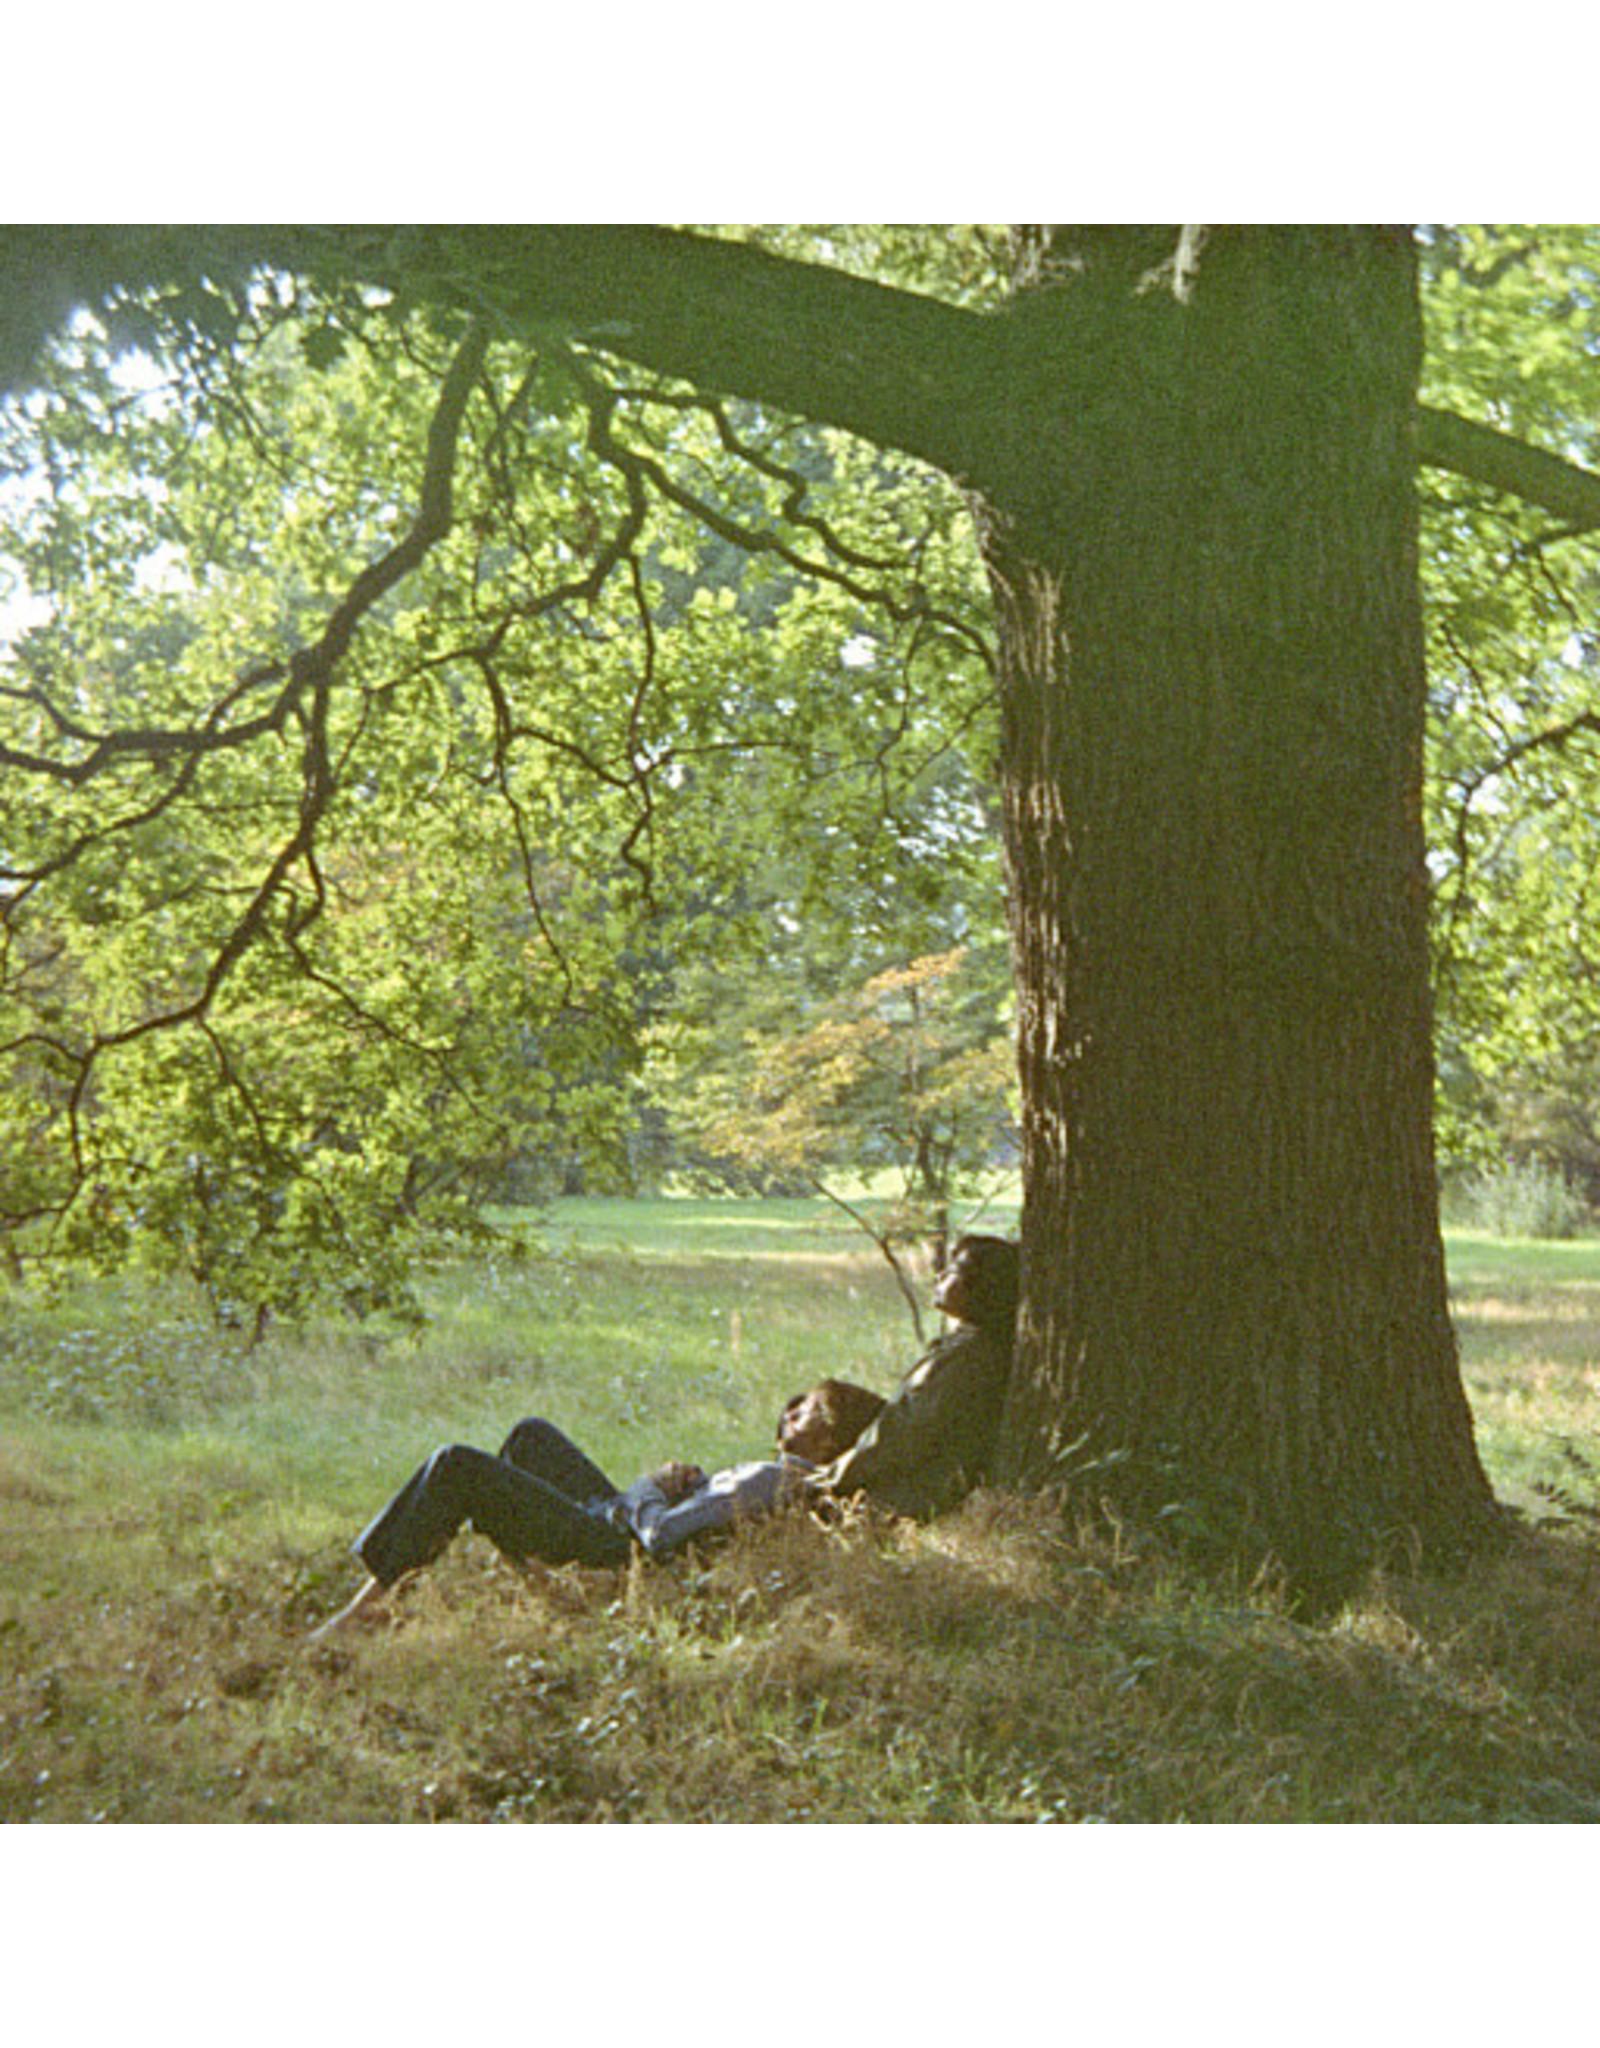 Lennon, John & Plastic Ono Band - John Lennon & the Plastic Ono Band (the Ultimate mixes) 2CD